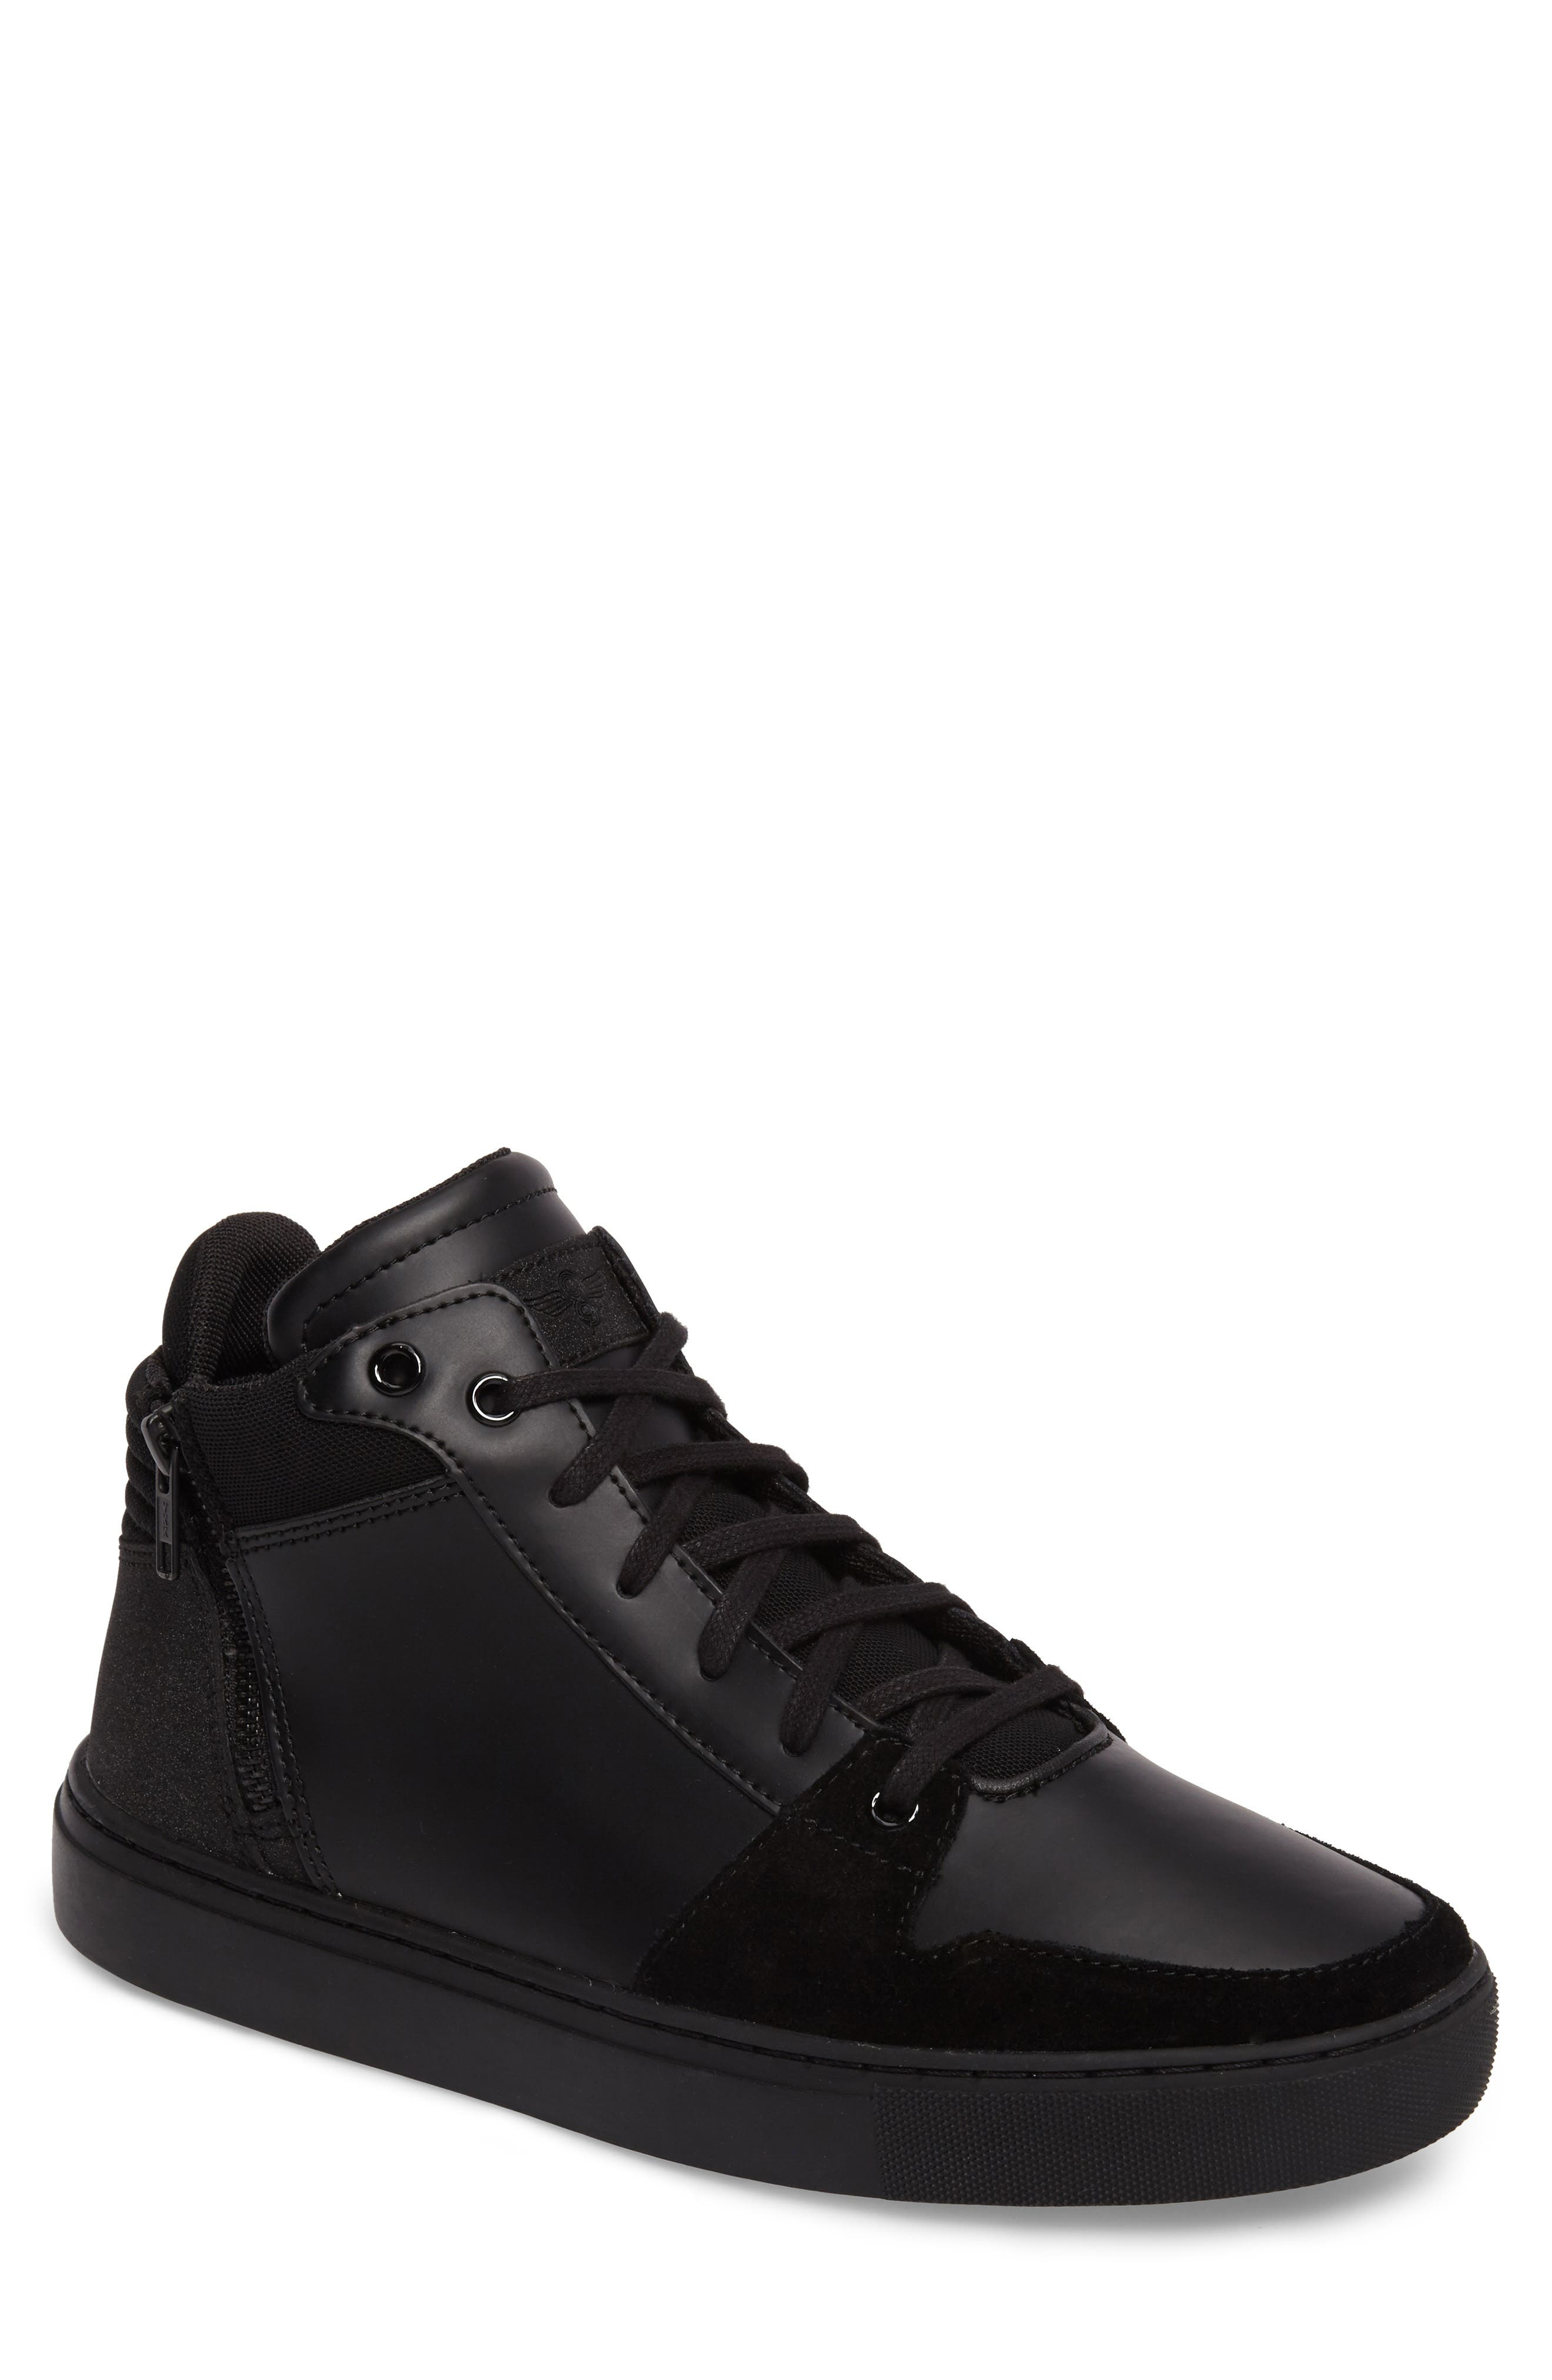 Modena Sneaker,                             Main thumbnail 1, color,                             Black Tech